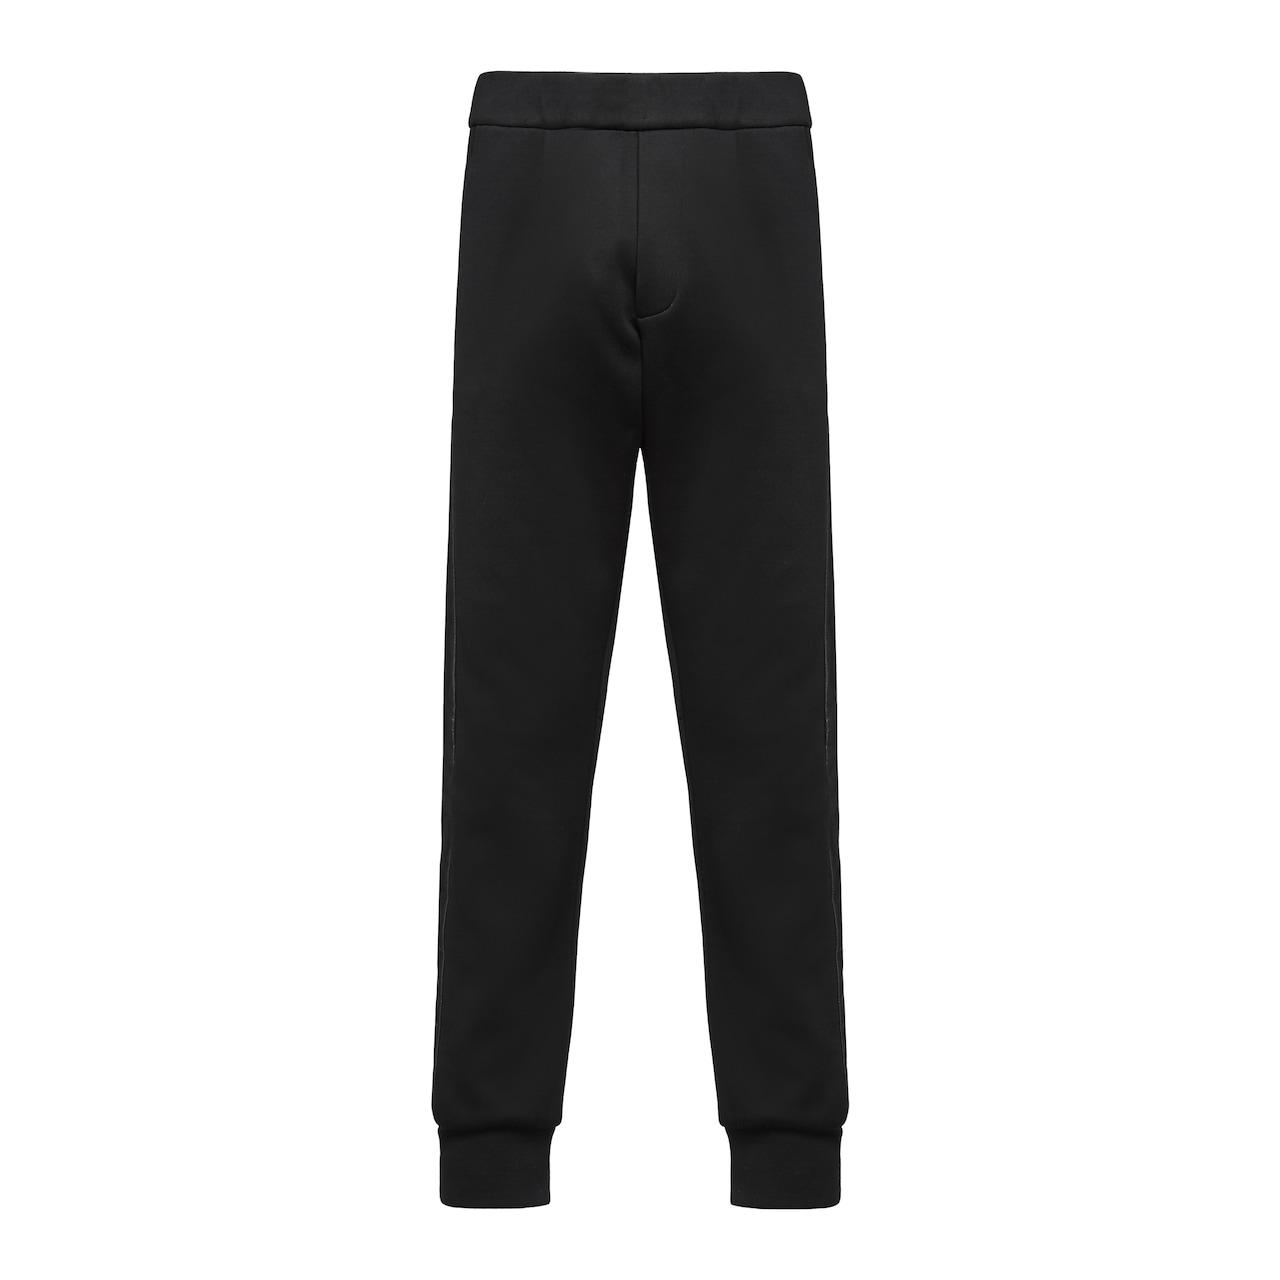 Technical cotton fleece trousers